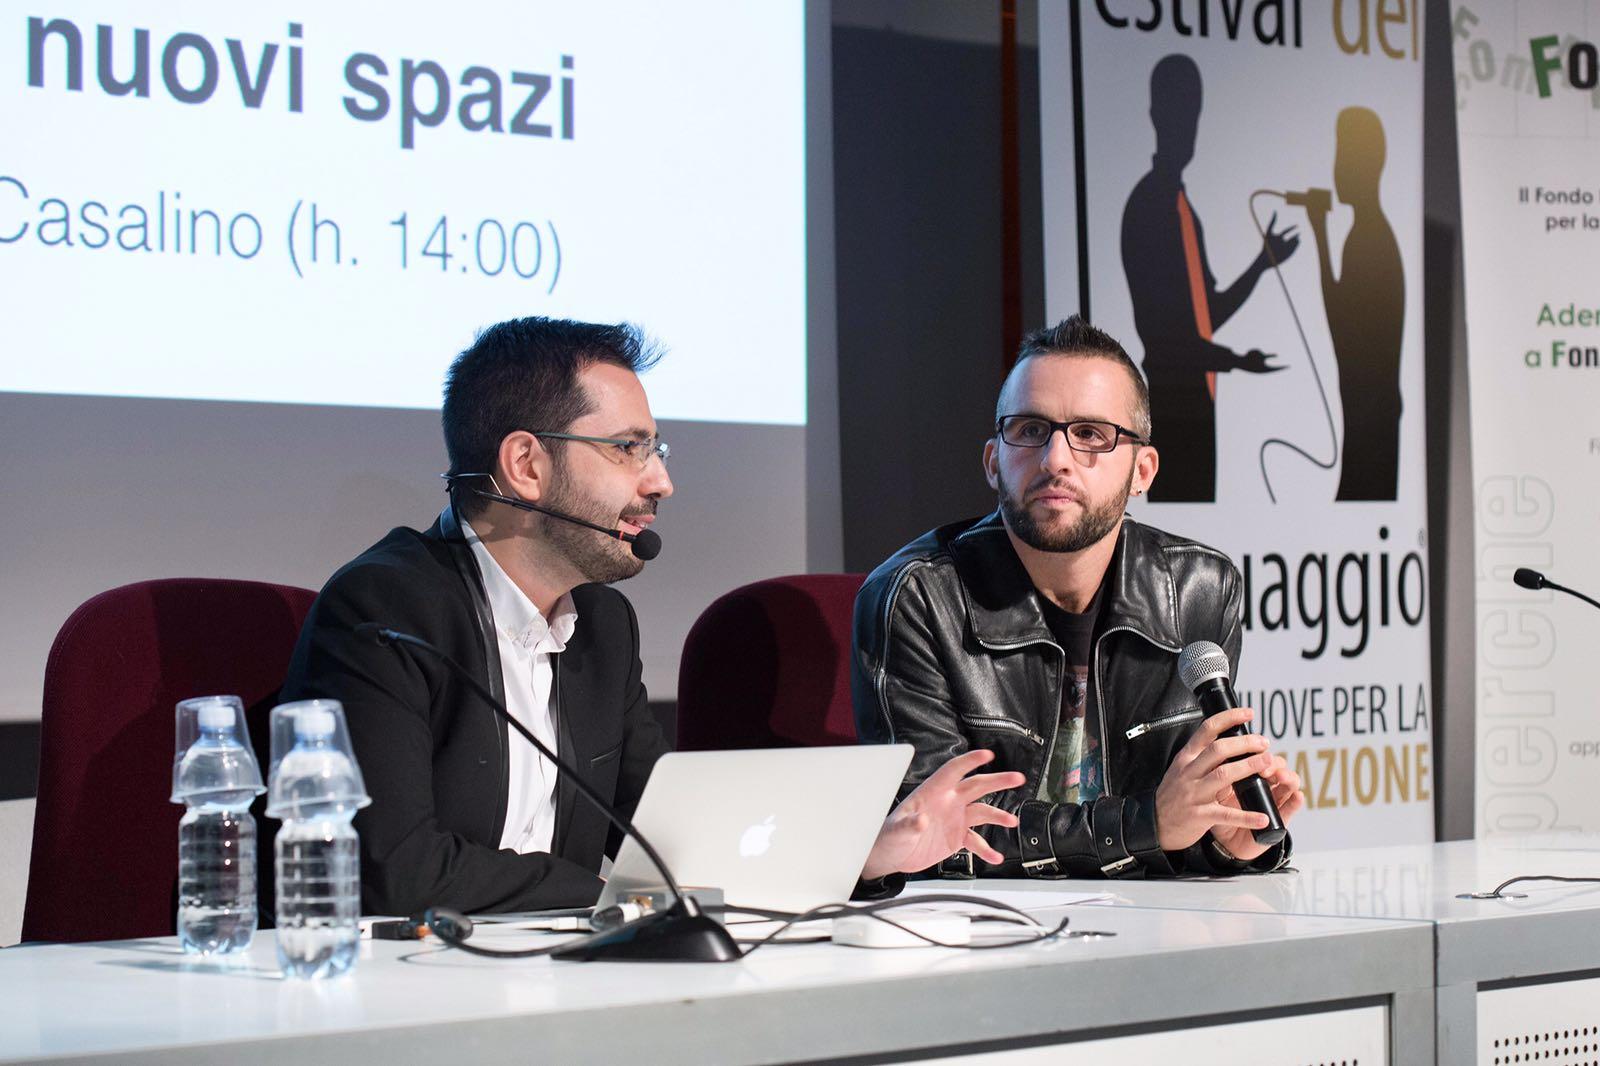 Patrick Facciolo e Roberto Casalino